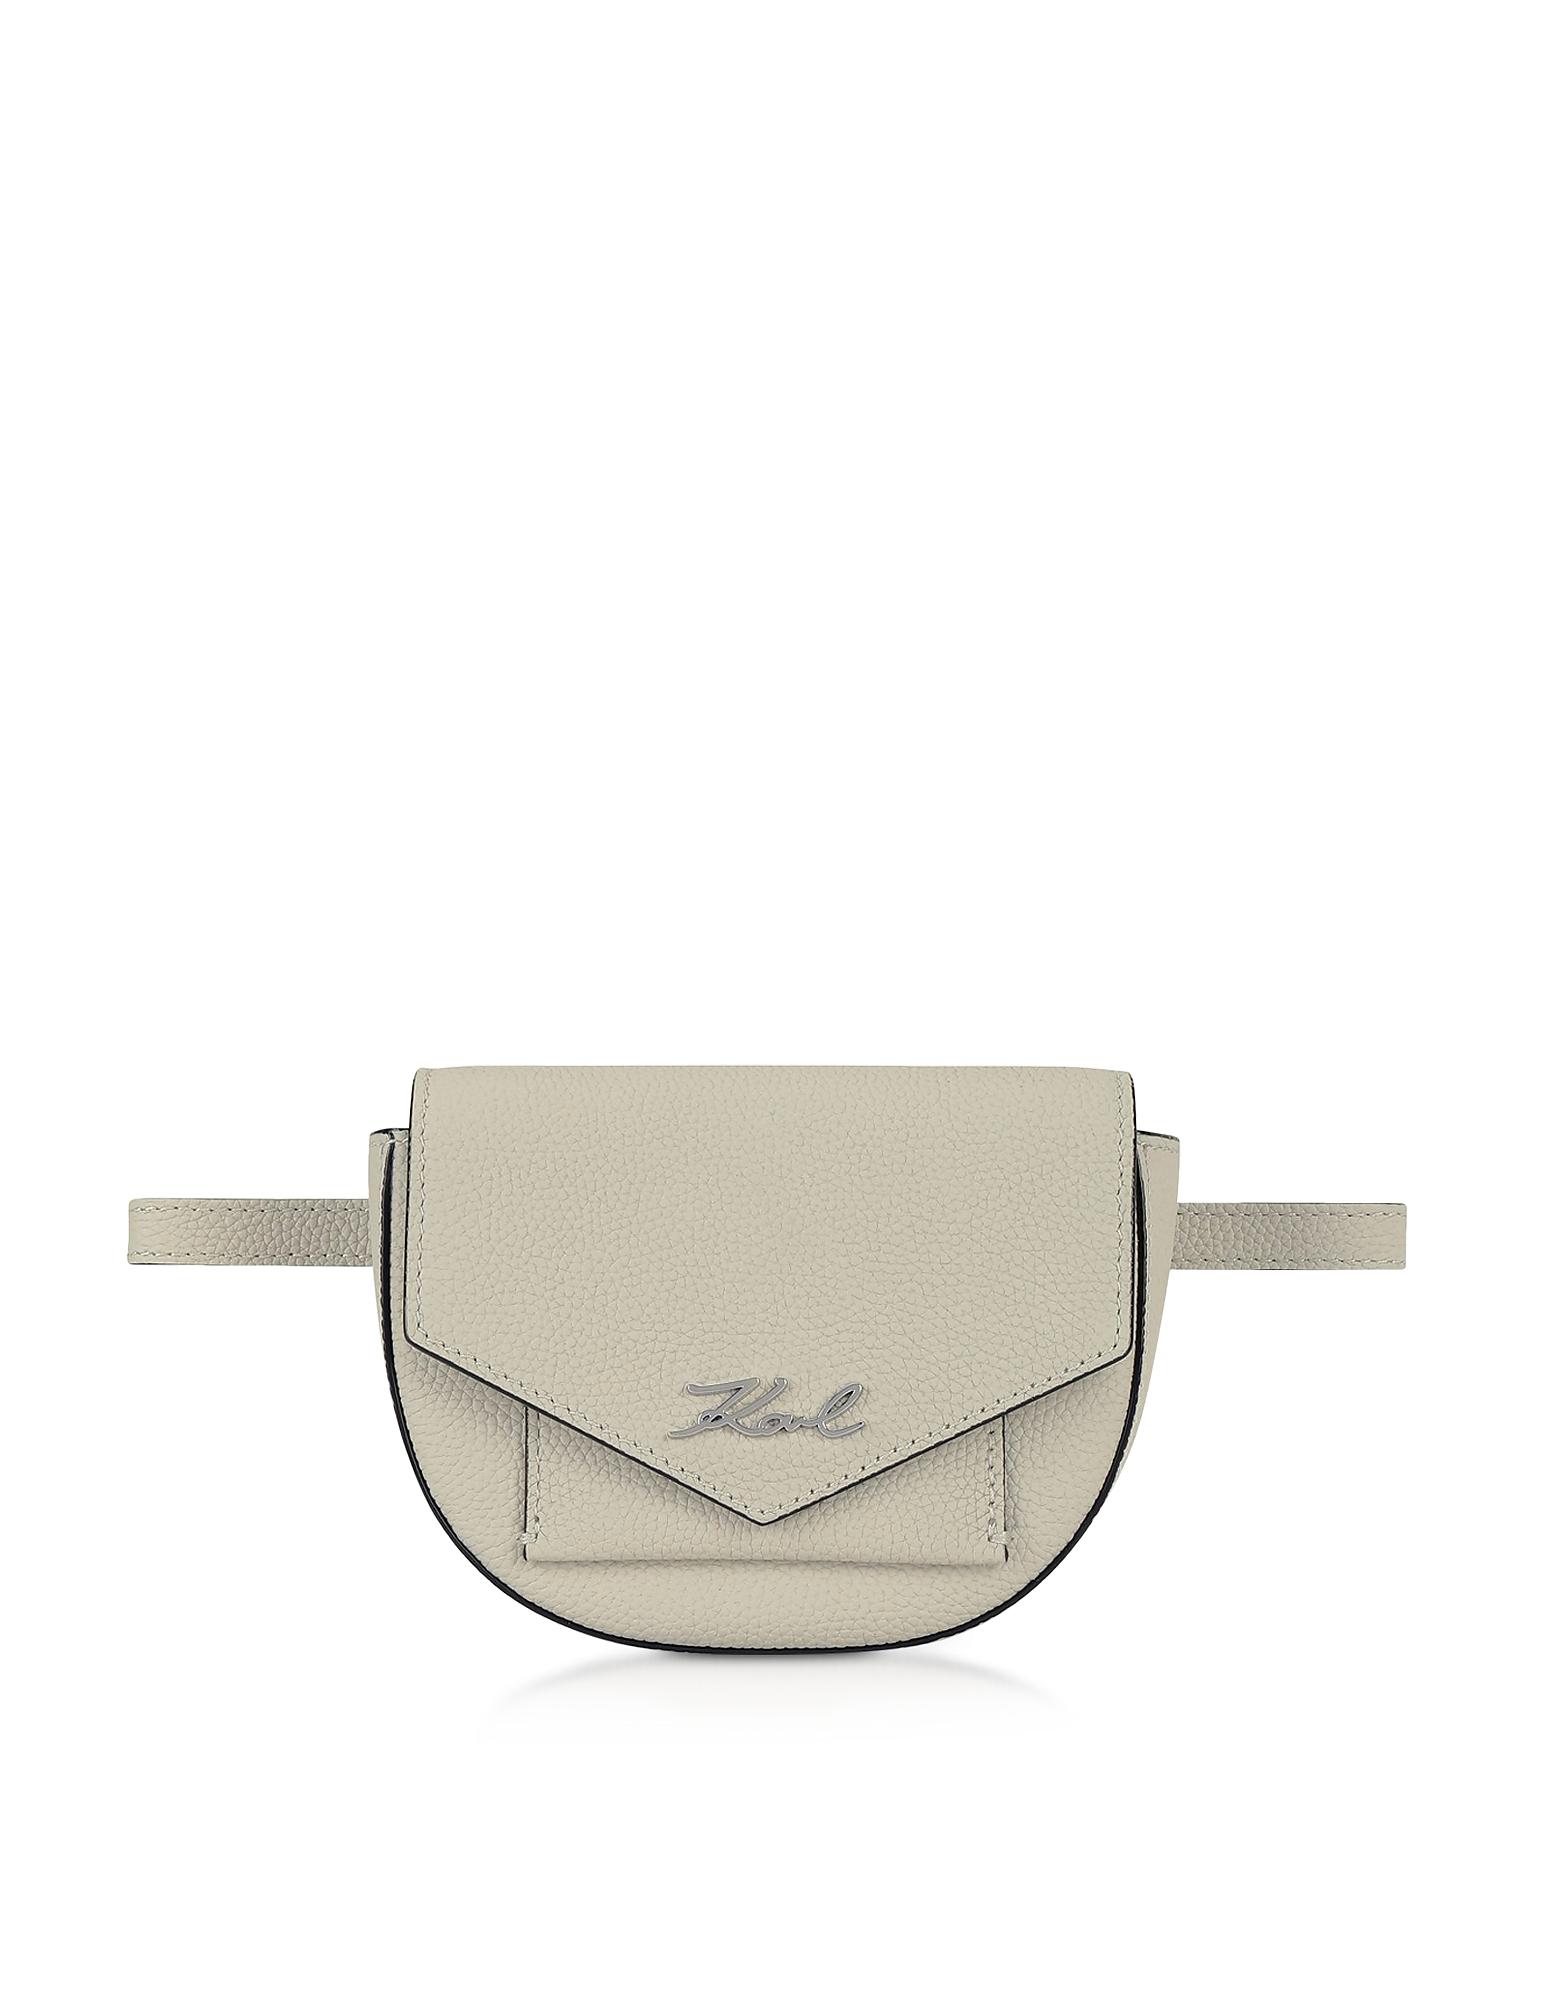 Karl Lagerfeld Designer Handbags, K/Essential Belt Bag